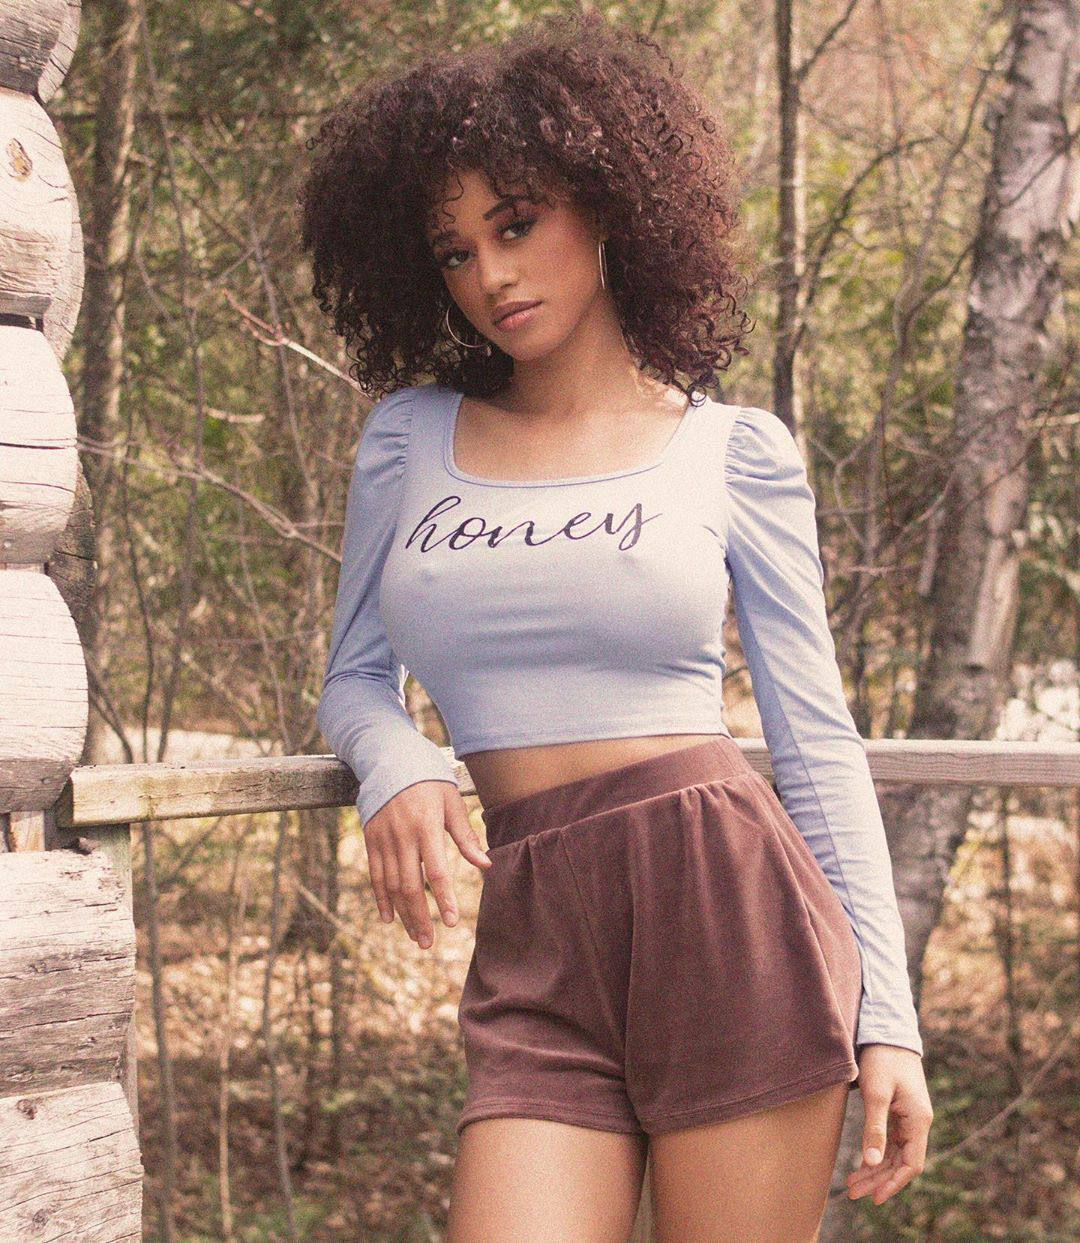 Stormi Maya – Sexy Big Breasts And Nipples In Racy Instagram Pics 0001